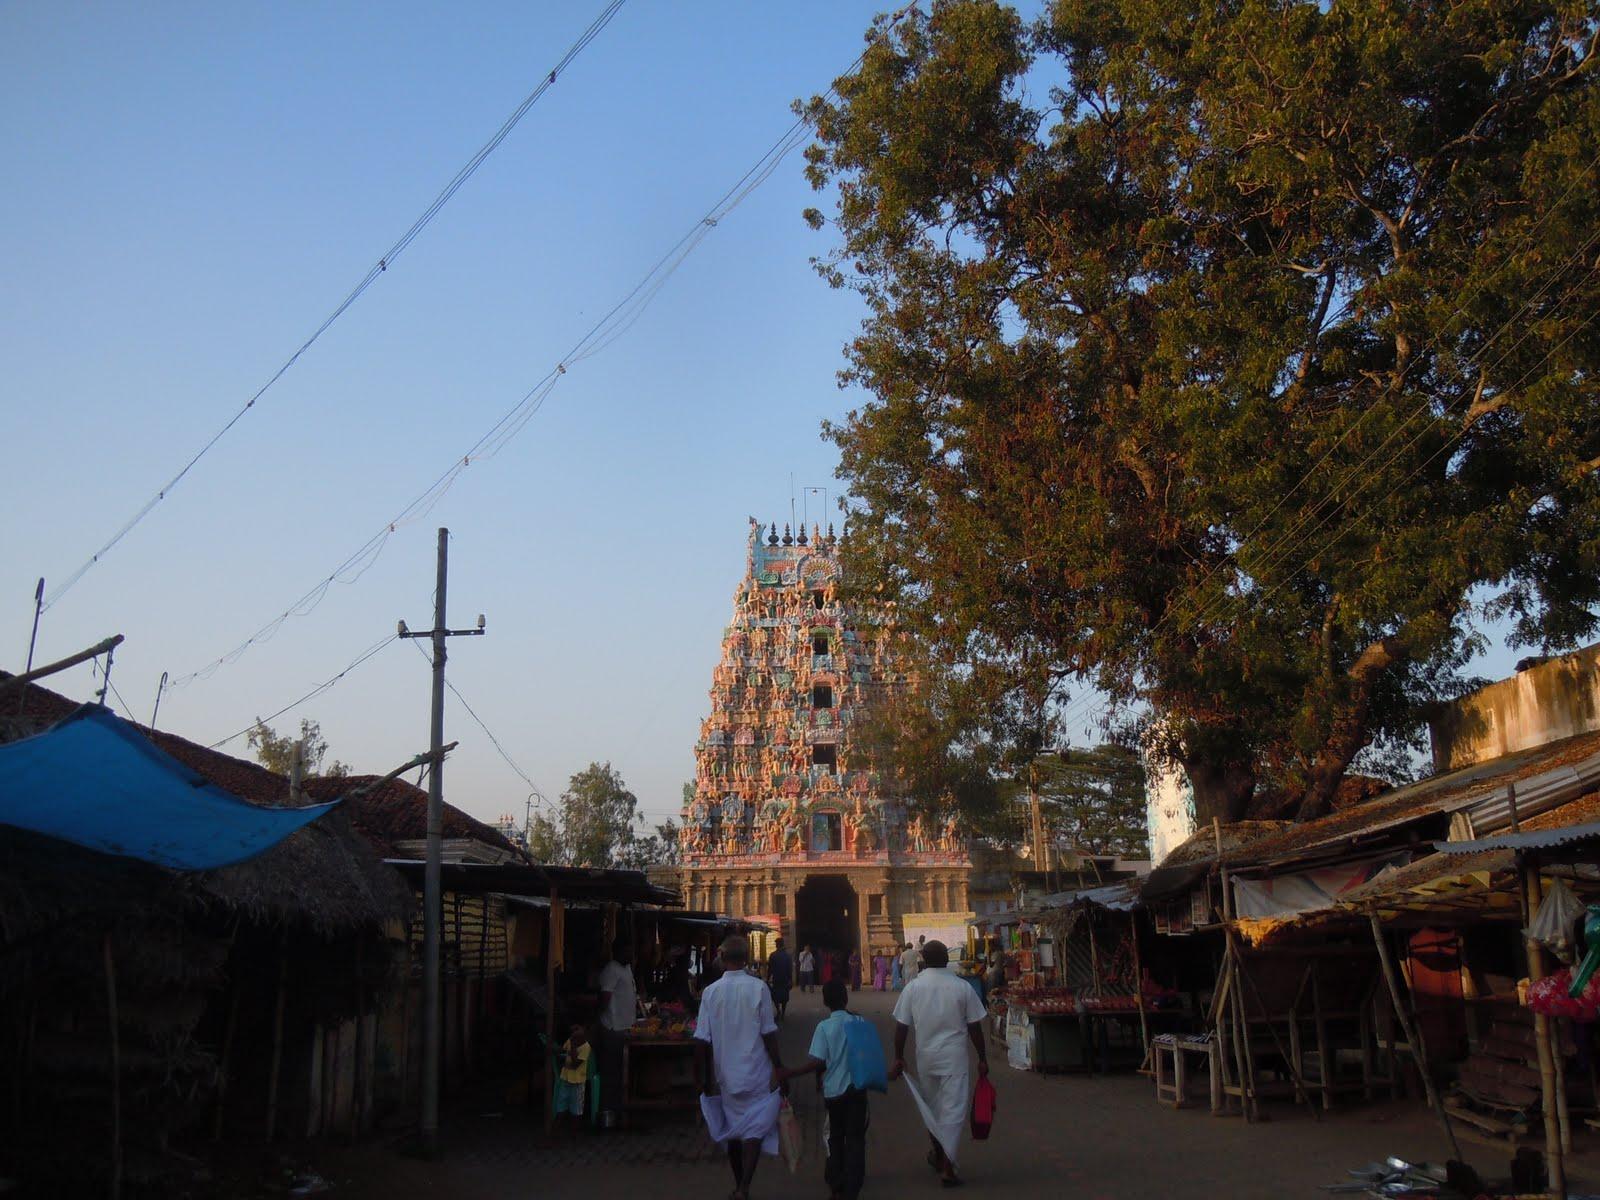 Sri Aabathsahayeswarar Temple, Alangudi - Navagraha Temple Darshan (Lord Guru-Jupiter Stalam)